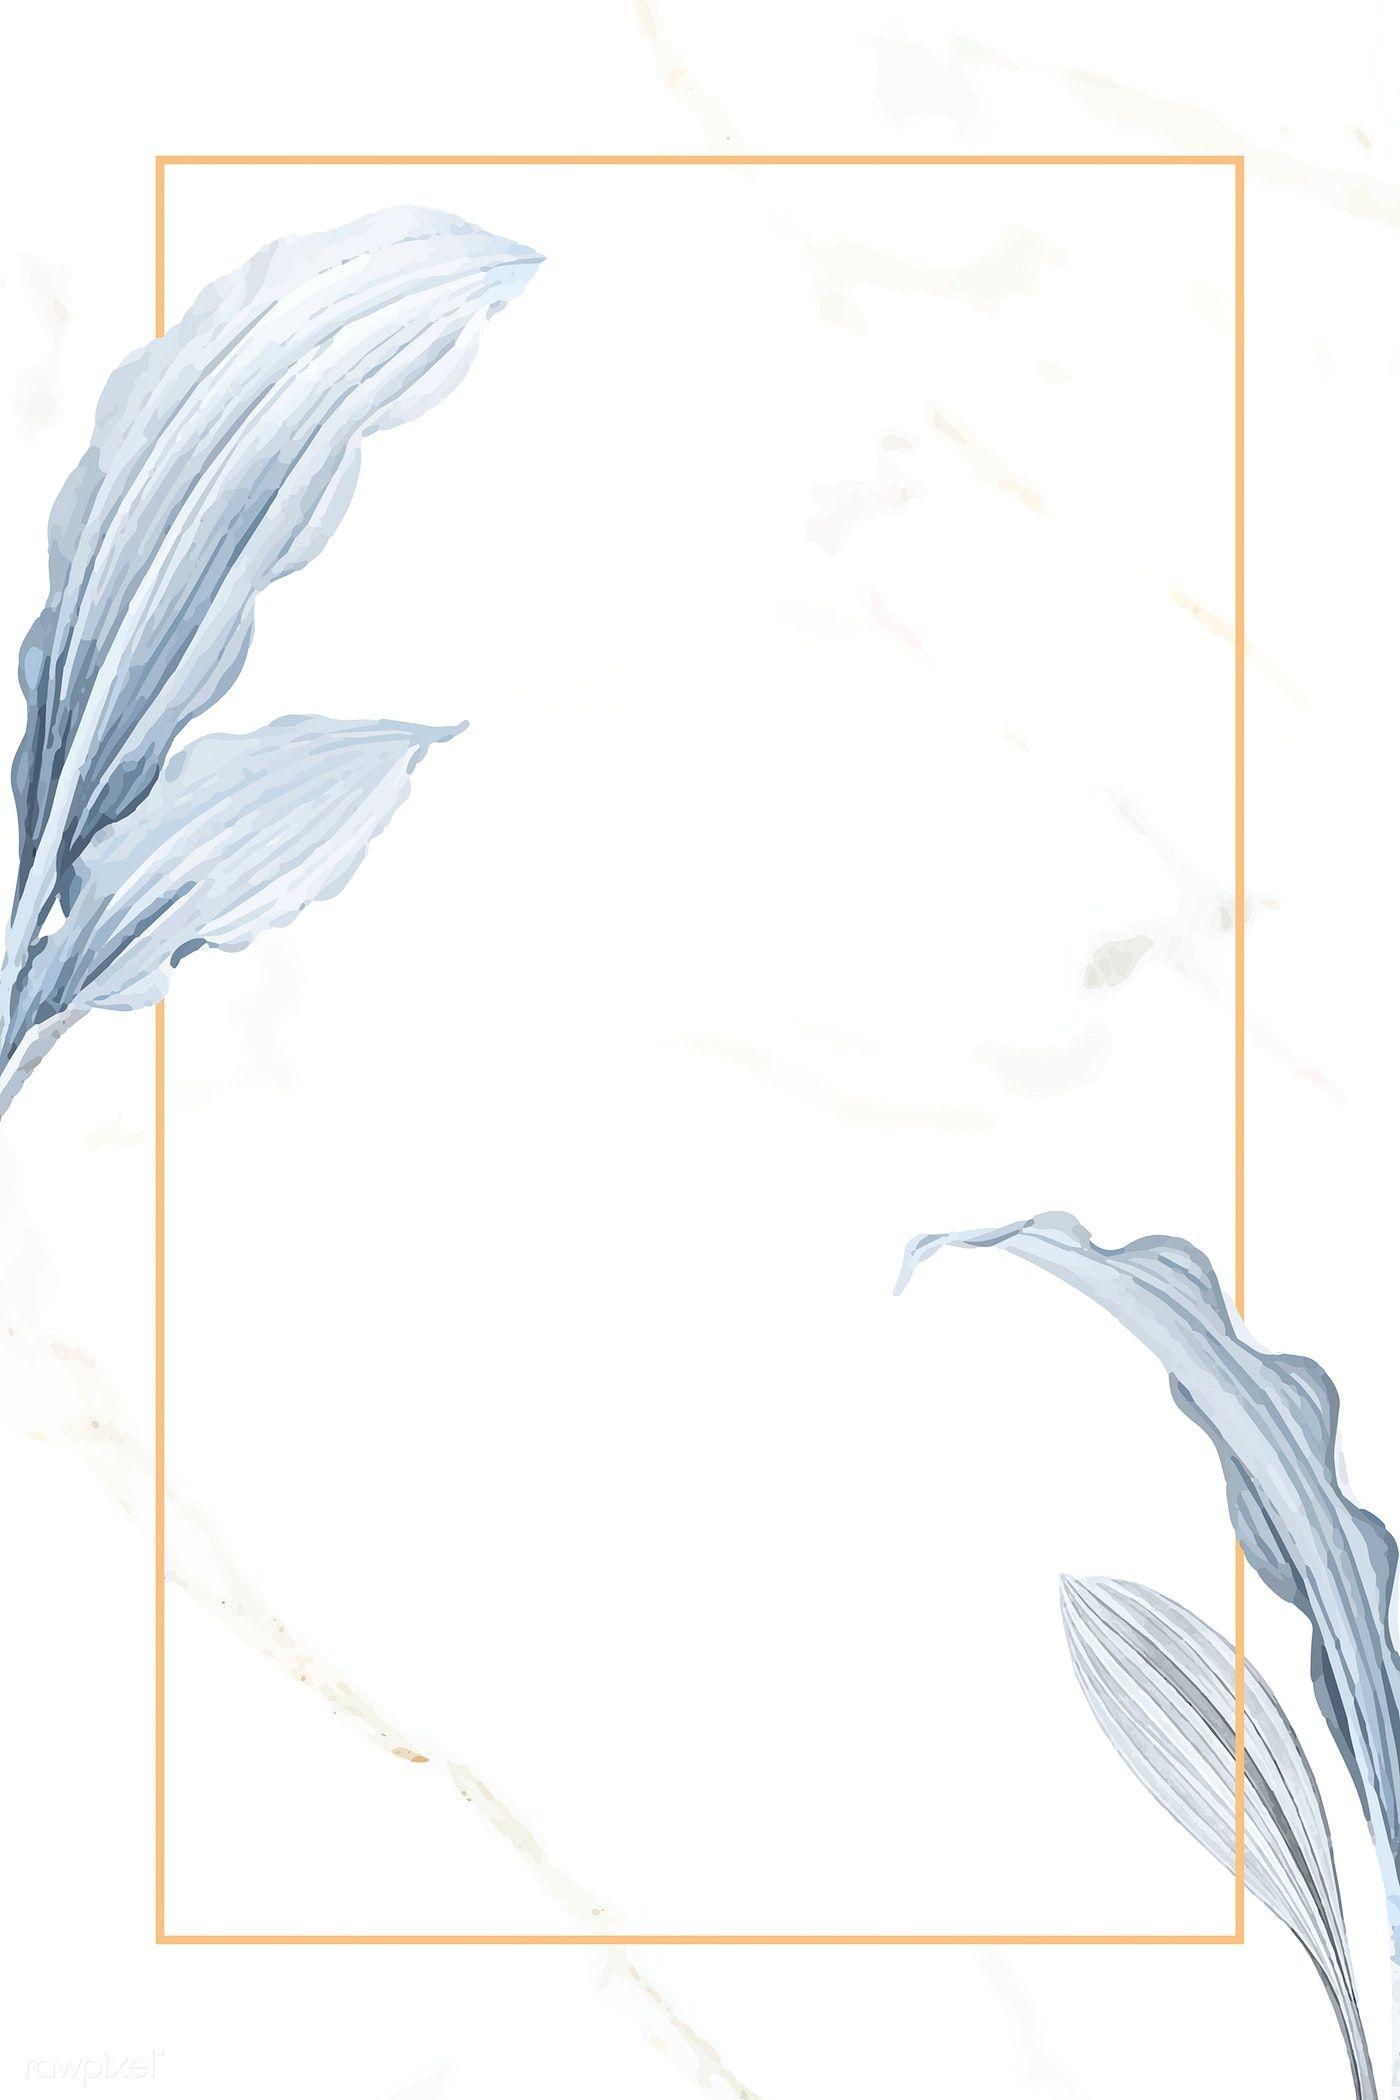 Leafy rectangle frame design vector | premium image by rawpixel.com / sasi